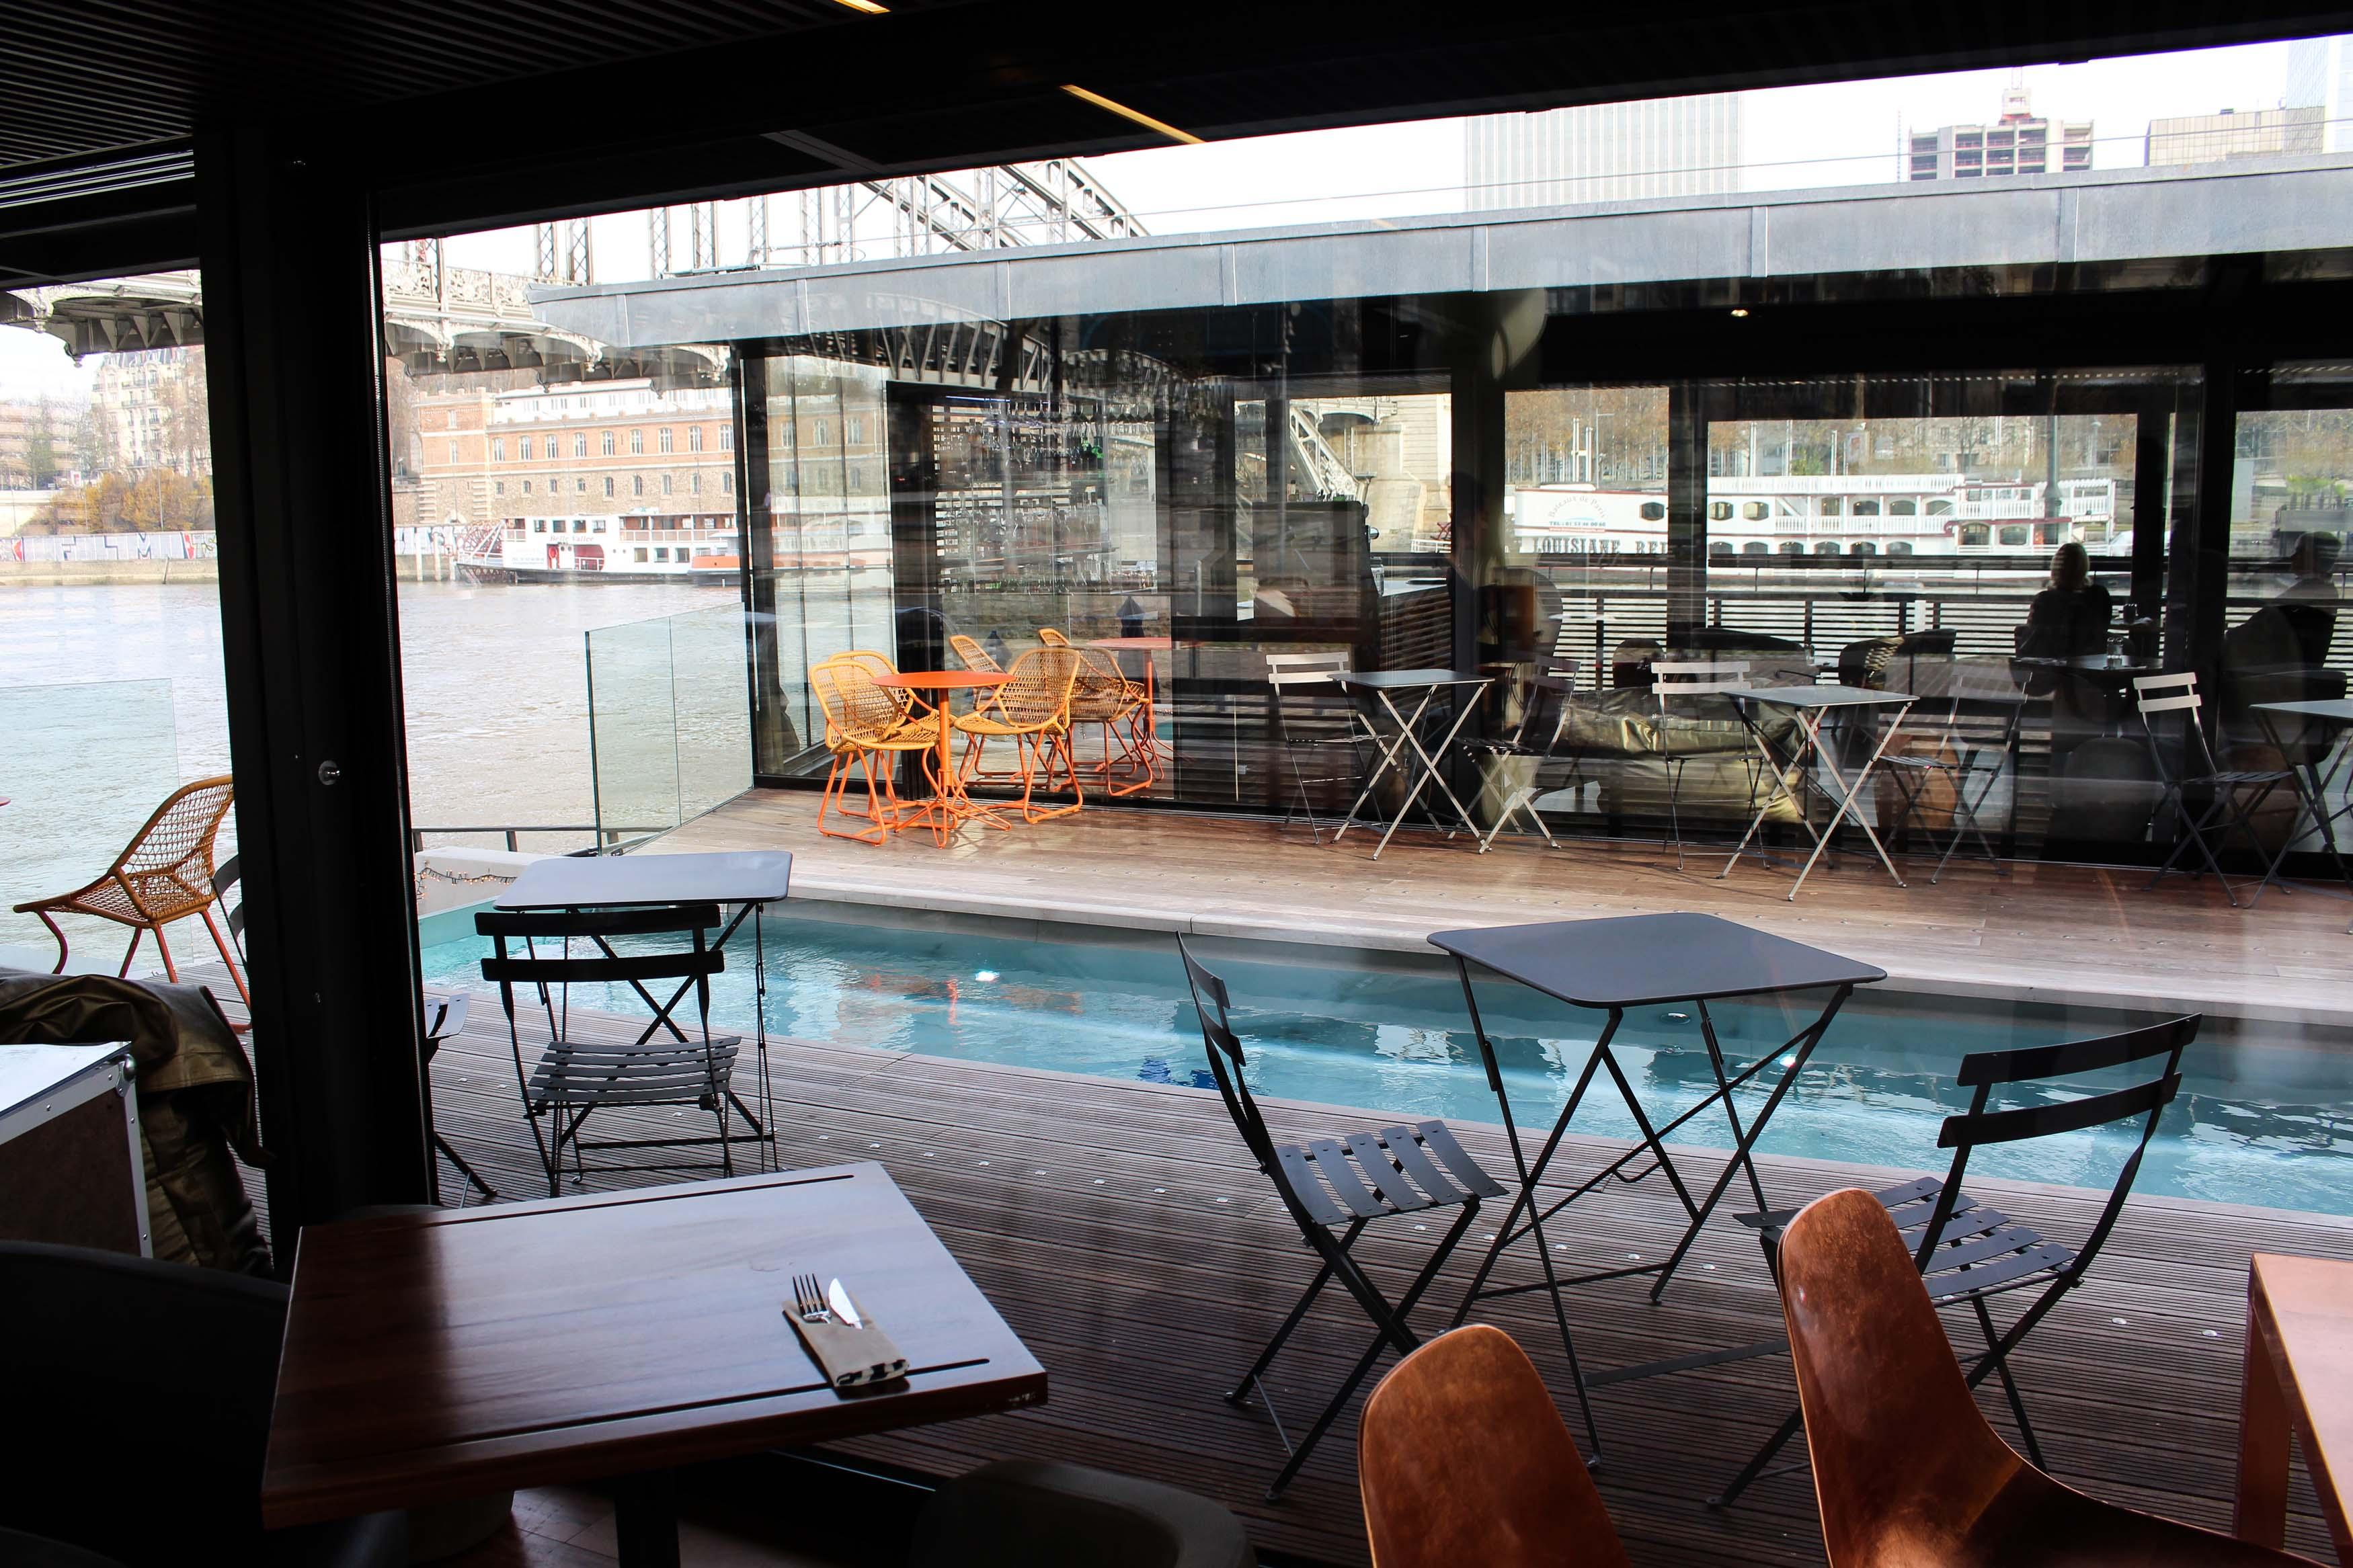 hotel-paris-offparisseine-linstantflo-15-sur-18